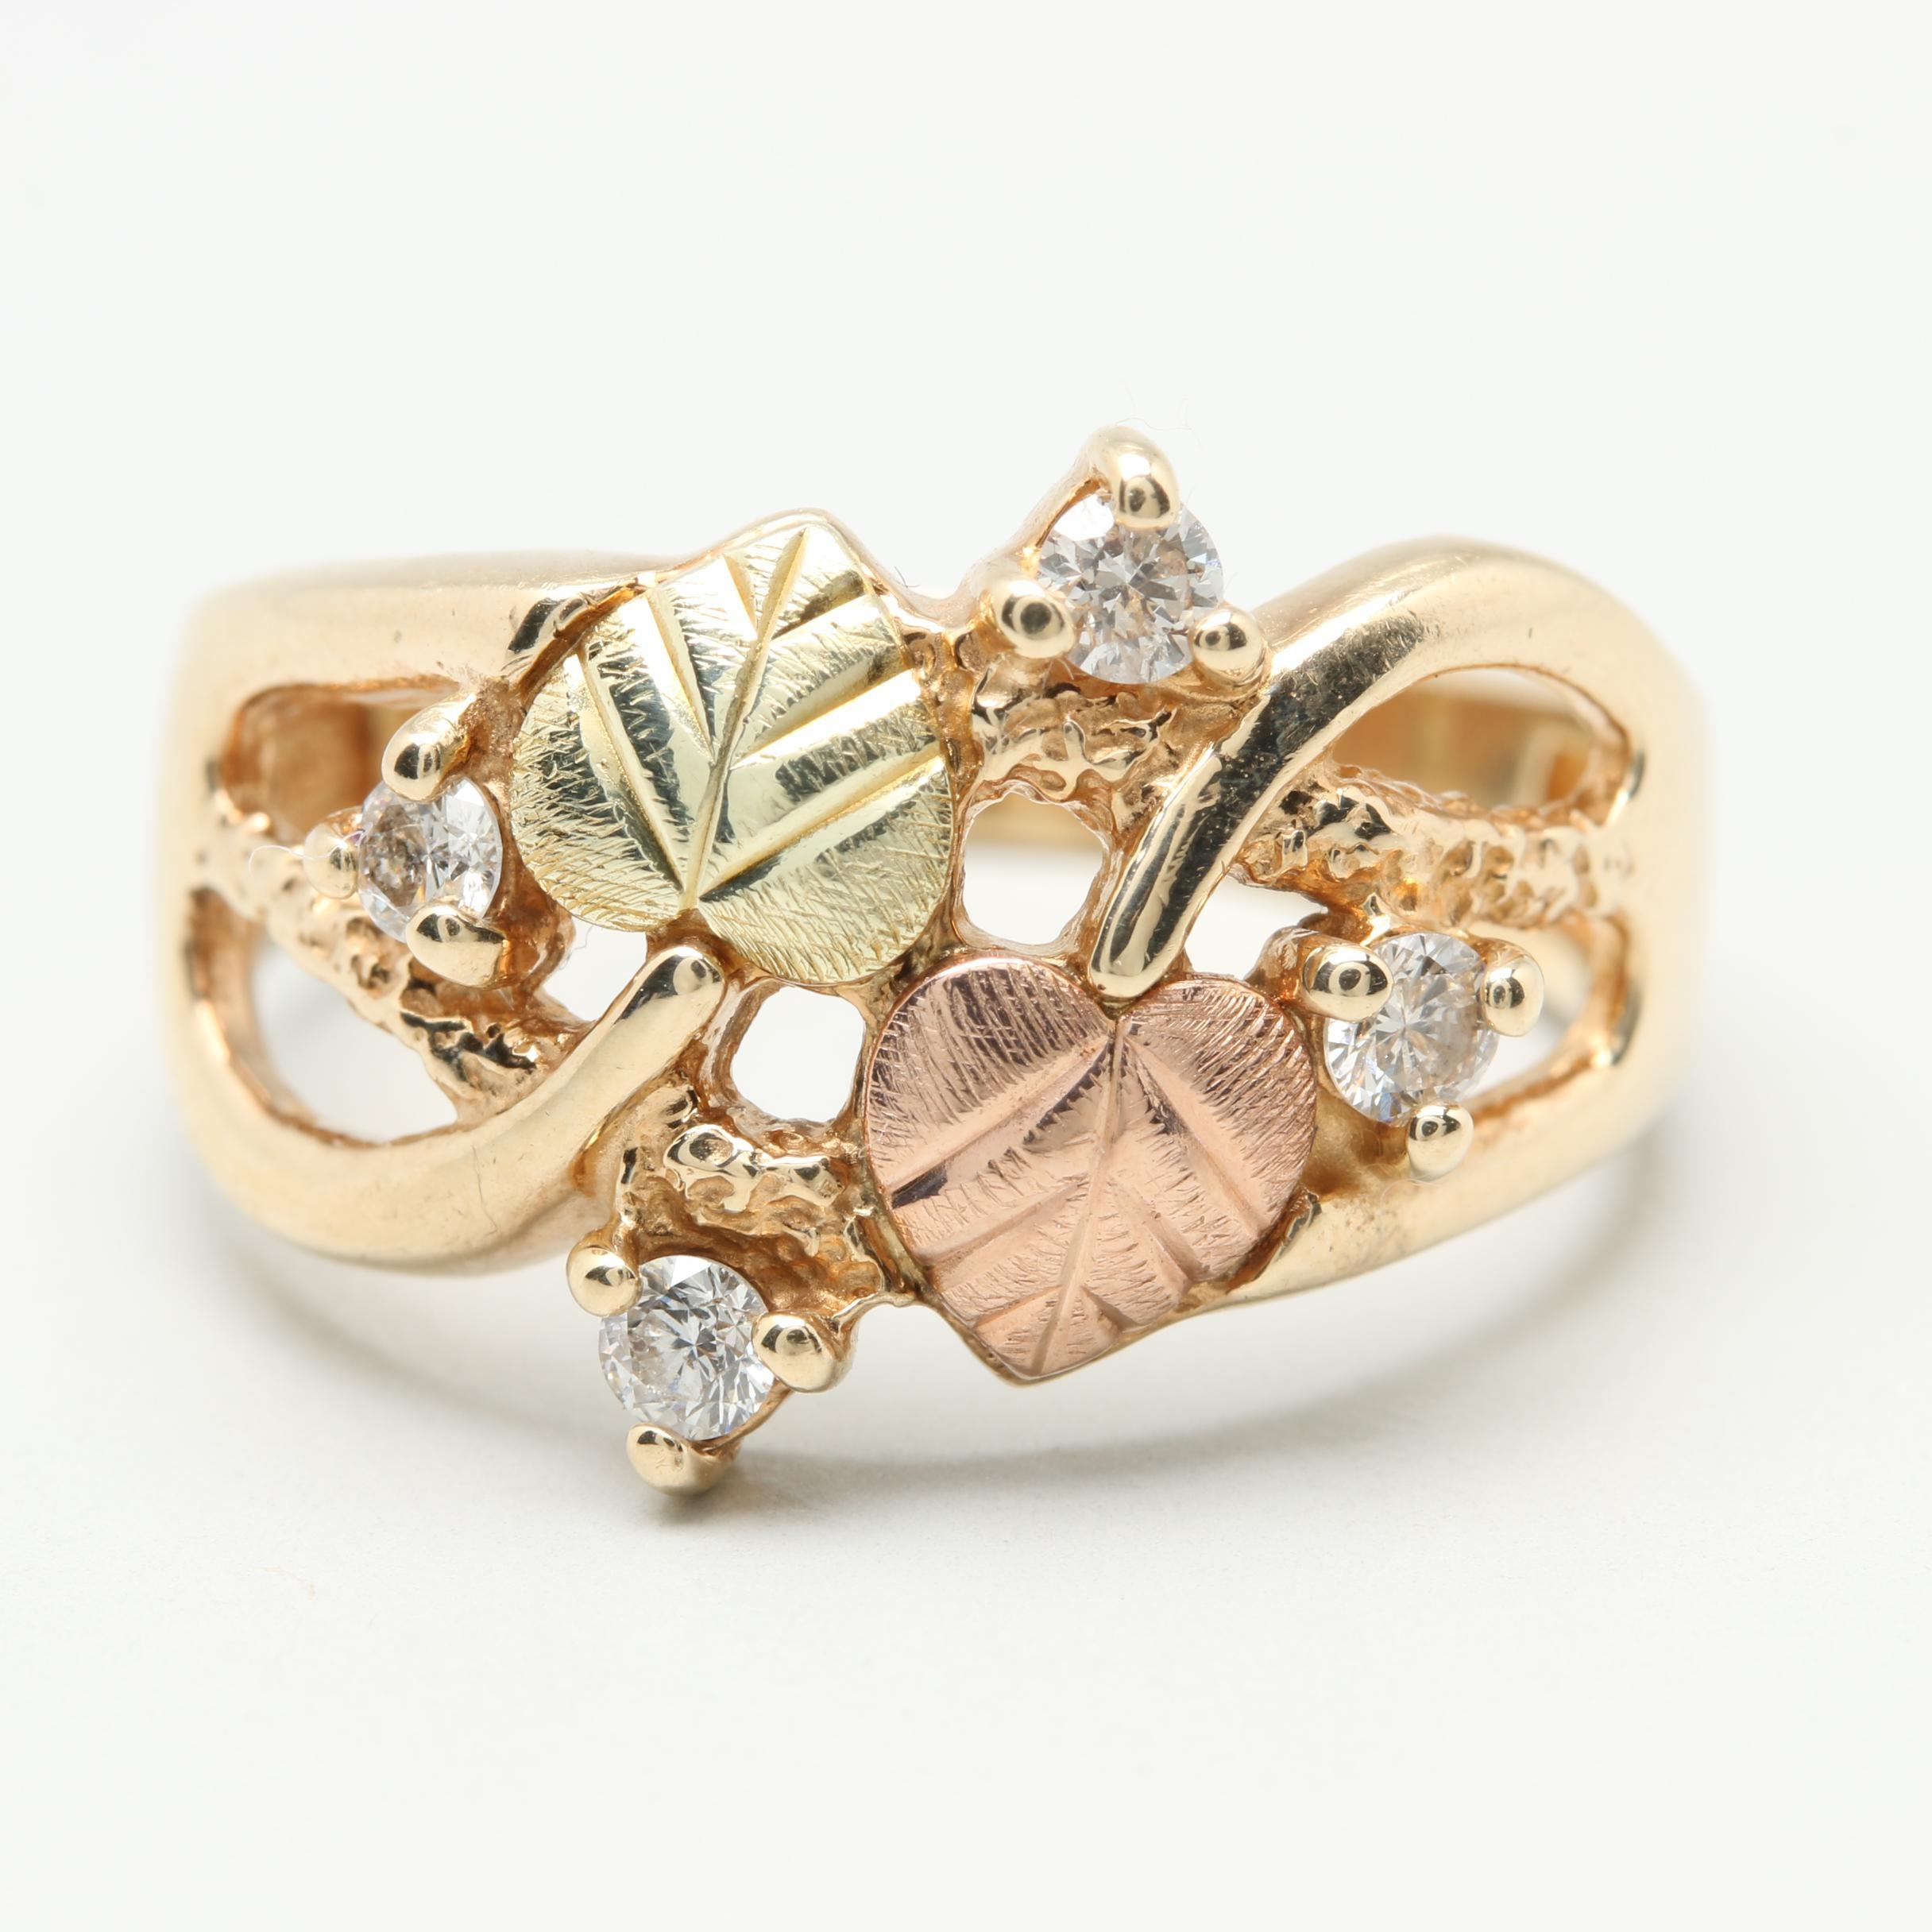 Coleman Black Hills Company 10K Tri-Gold Diamond Ring